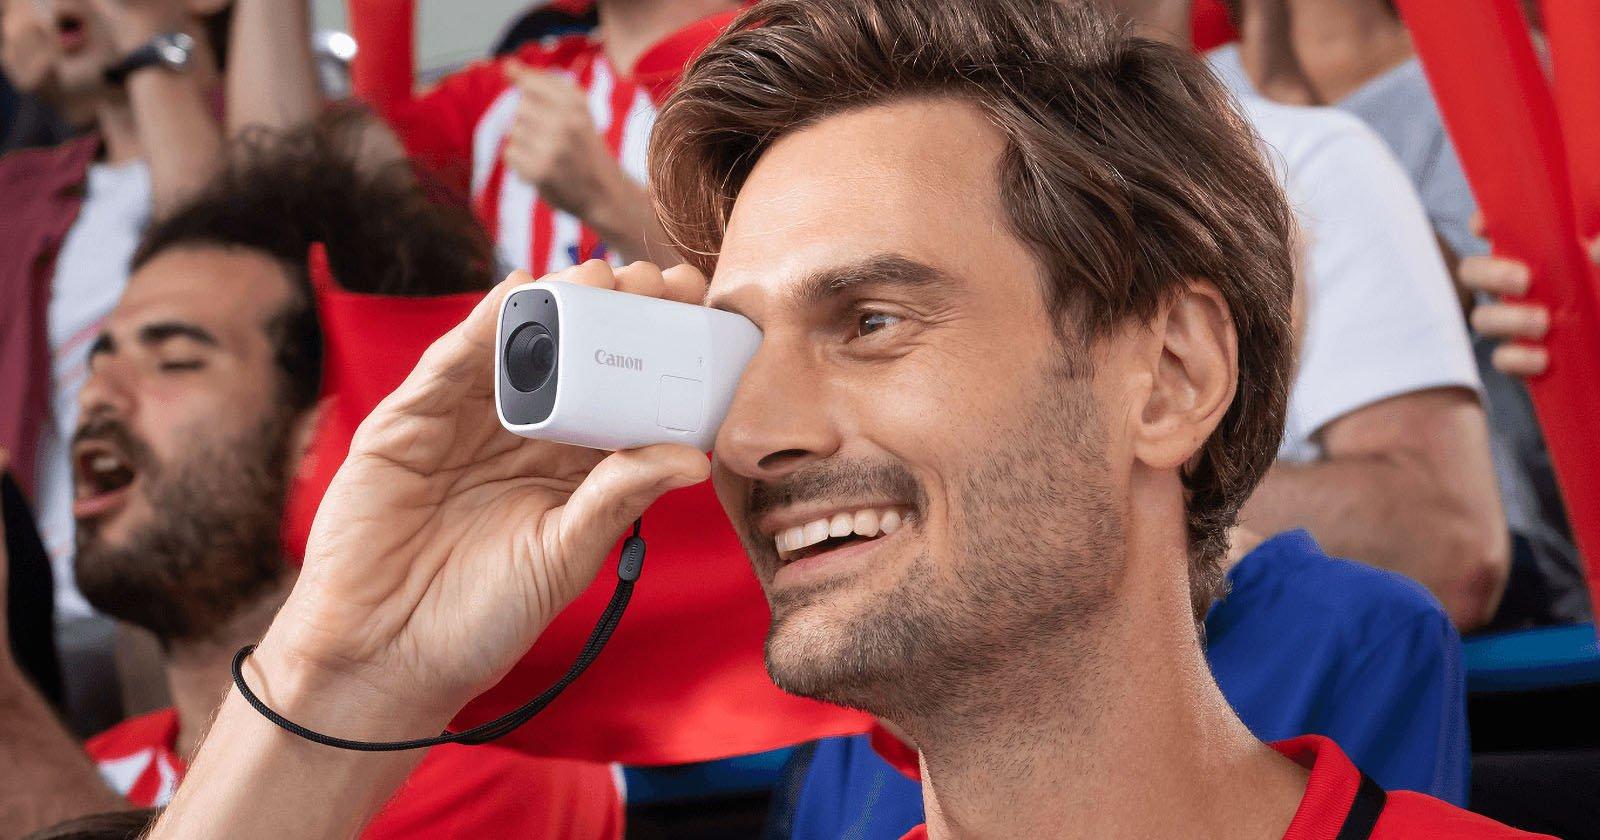 Canon Unveils the PowerShot Zoom, A Strange Monocular Camera